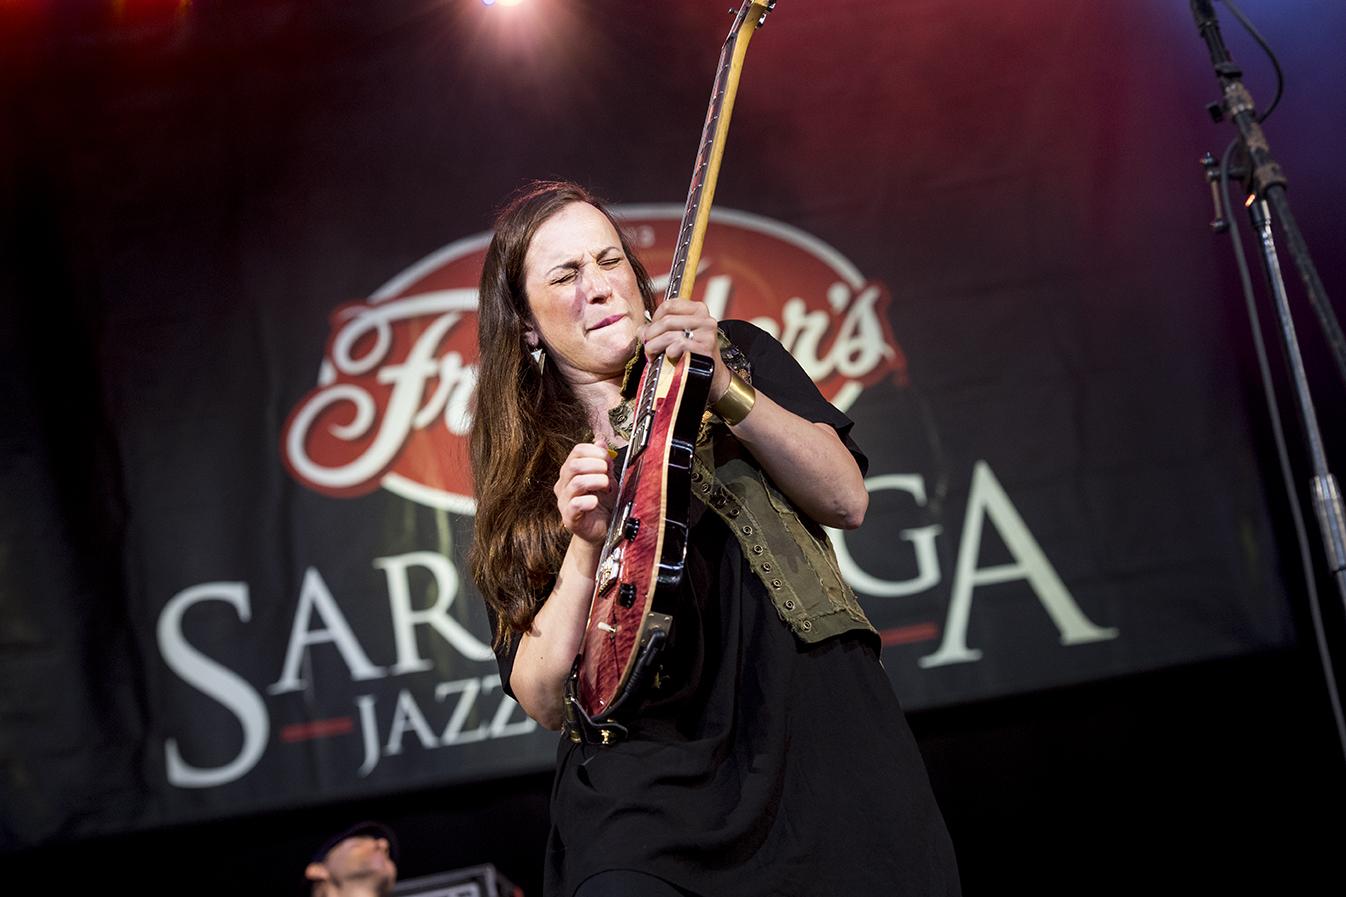 Donna Grantis at the 2019 Saratoga Jazz Festival